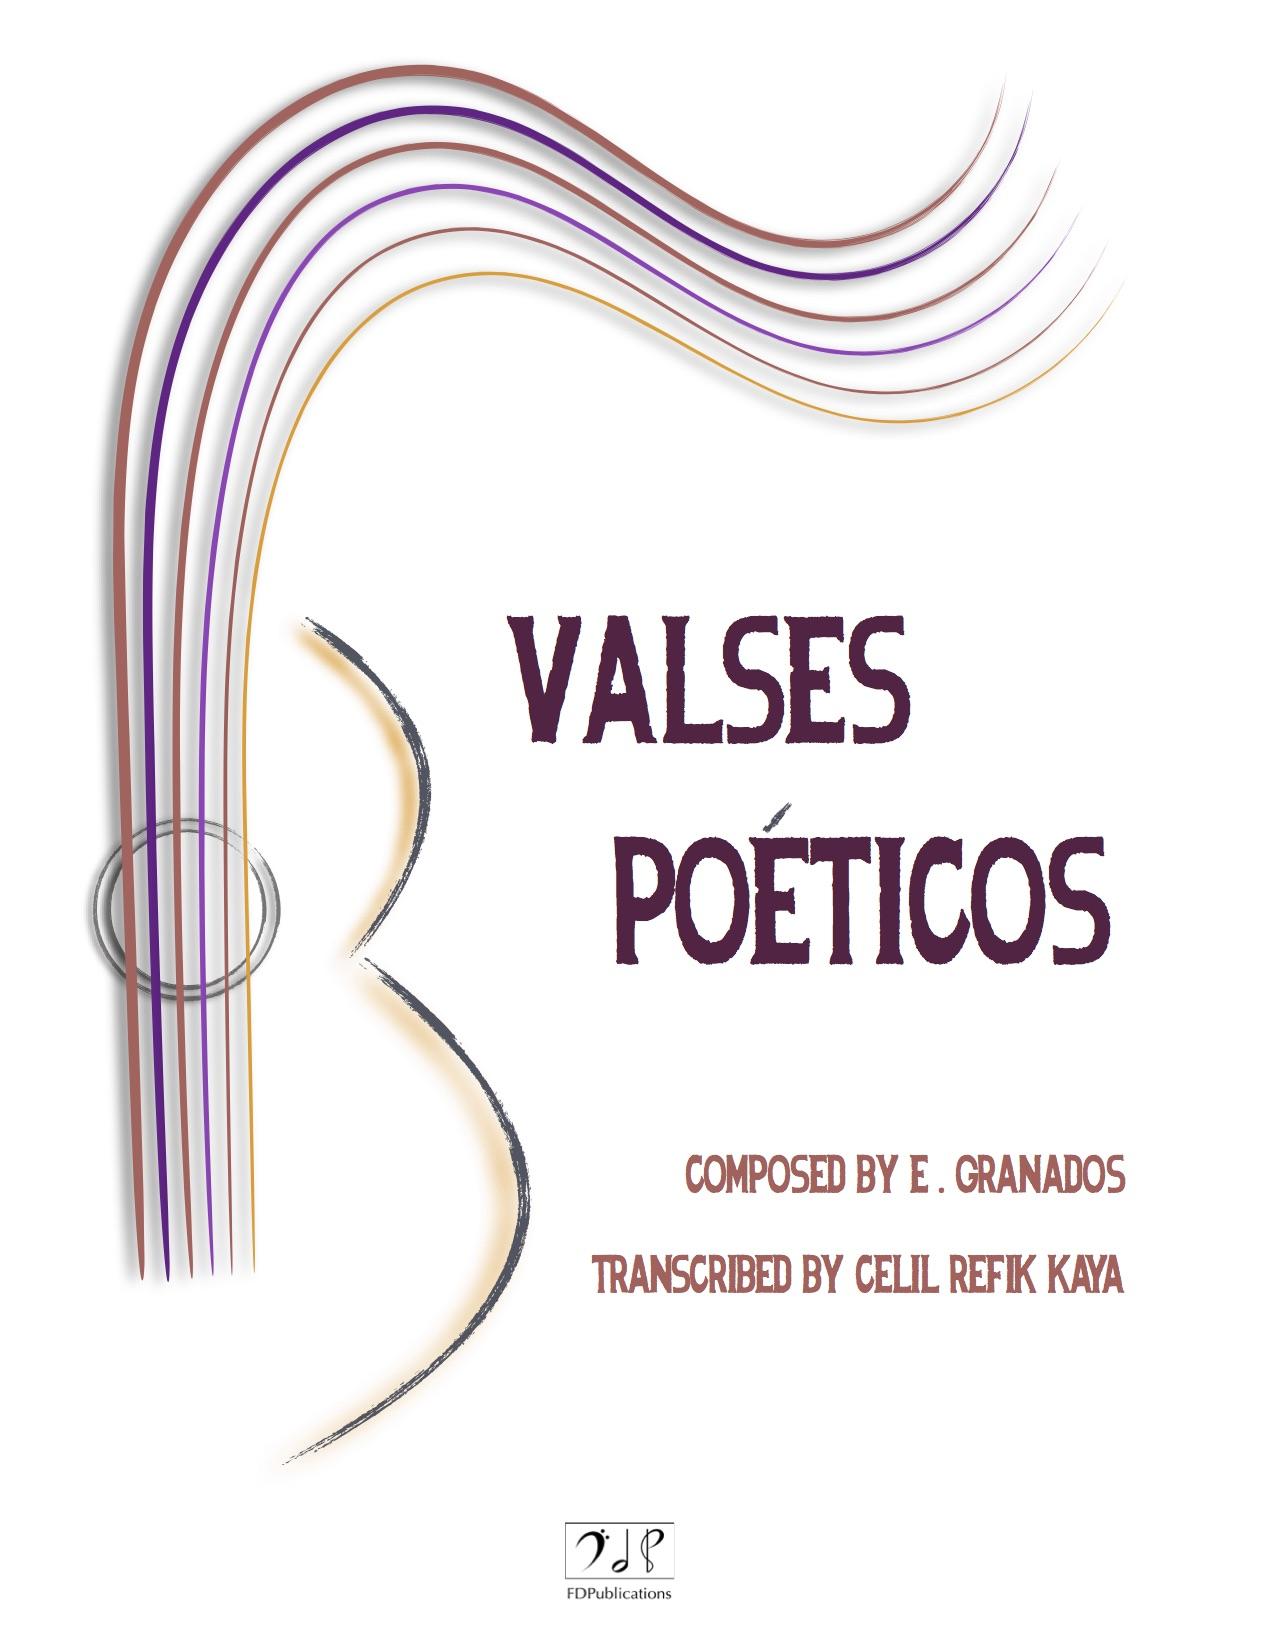 Valses Poéticos Composer: Enrique Granados Transcribed : Celil Refik Kaya Published: FDPublications